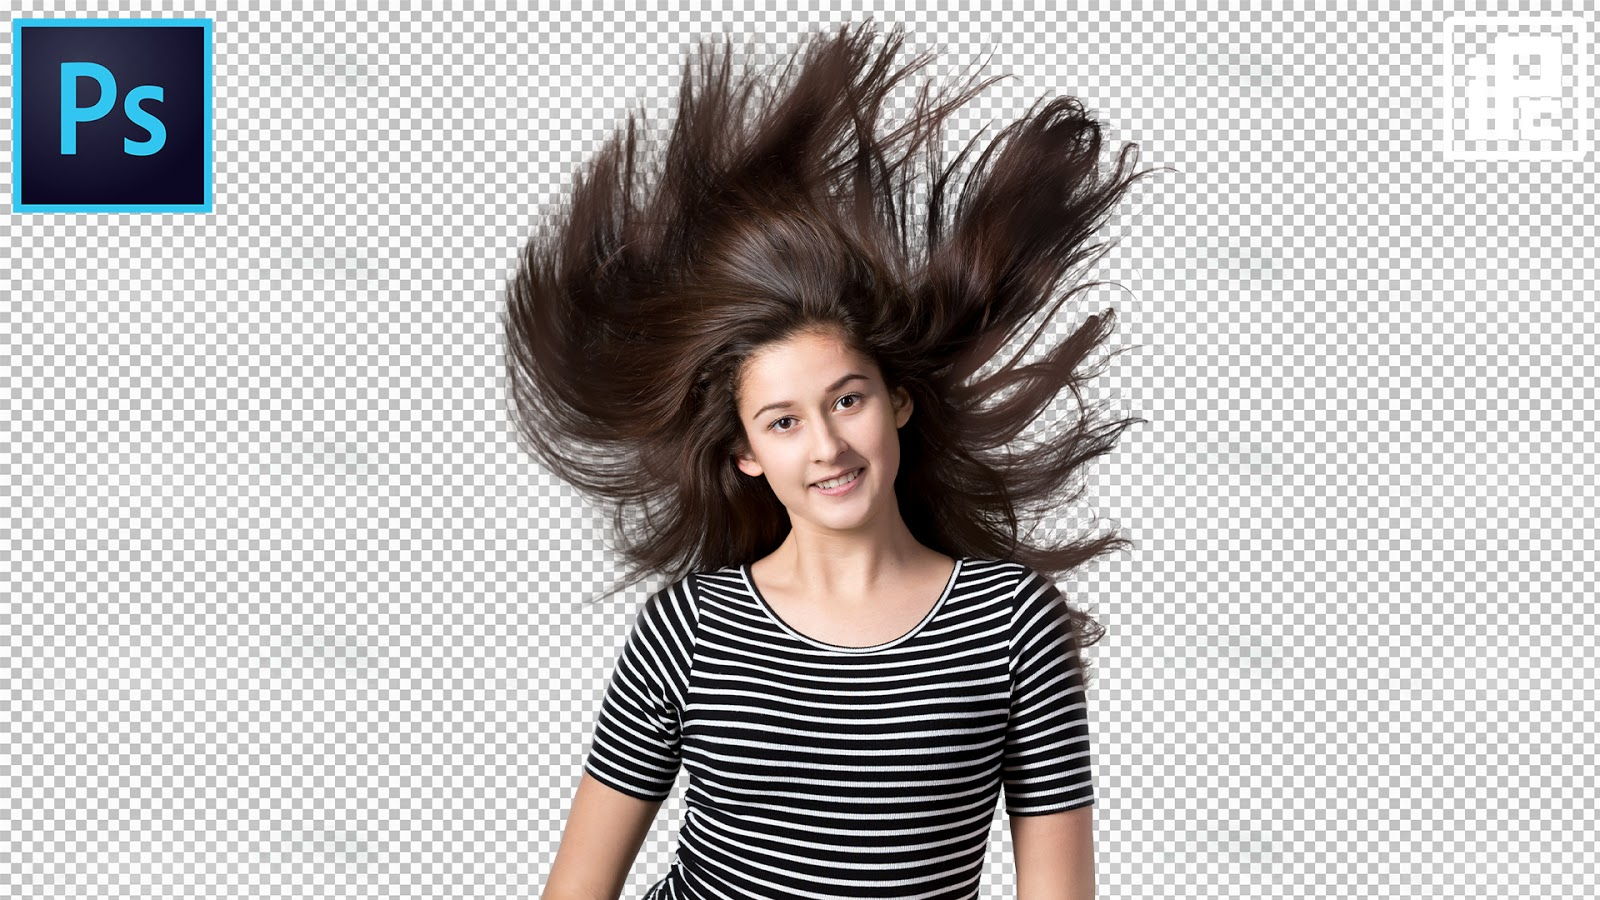 illphocorphics,illphocorphics tutorials,photoshop,photoshop tutorials,photoshop cc,photoshop cc tutorial,how to cut out hair in photoshop smoothly,how to cut out hair in photoshop,how to cut out hair in photoshop cc 2019,how to remove background in photoshop,how to remove background from hair in photoshop,remove hair from background photoshop,remove hair from background,best background remove tutorial,best way to remove hair from background,md sofikul i.f,ipc, photo, image, model photo, hair model, model hair, female, model, female model